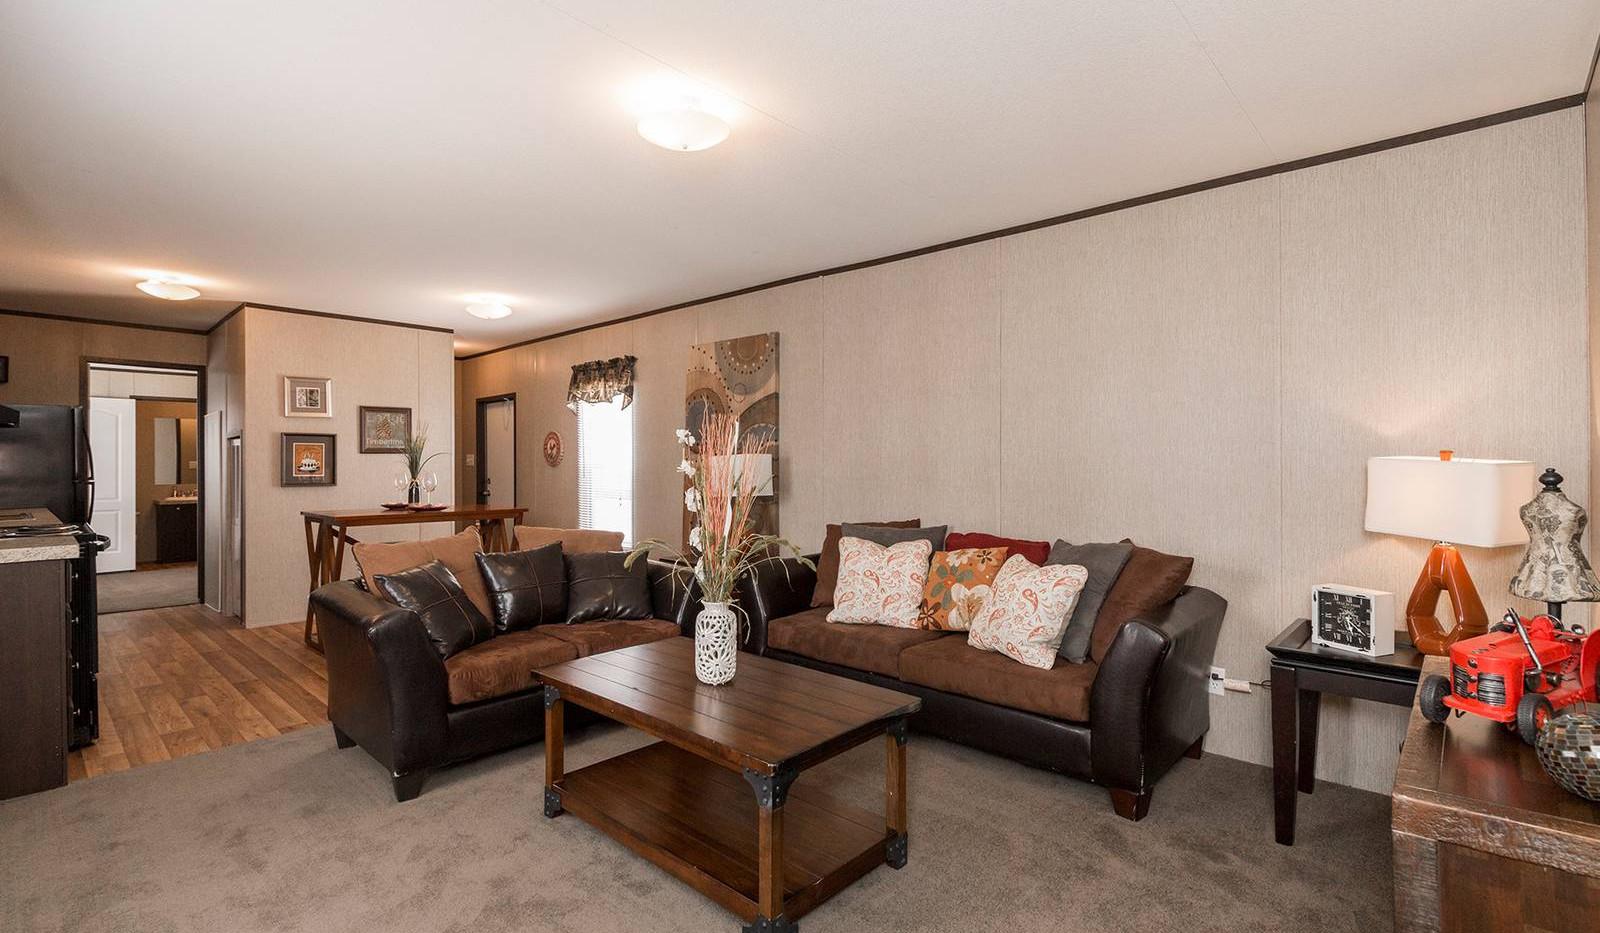 2-redman-1466a-living-room-1-1600x1067.j